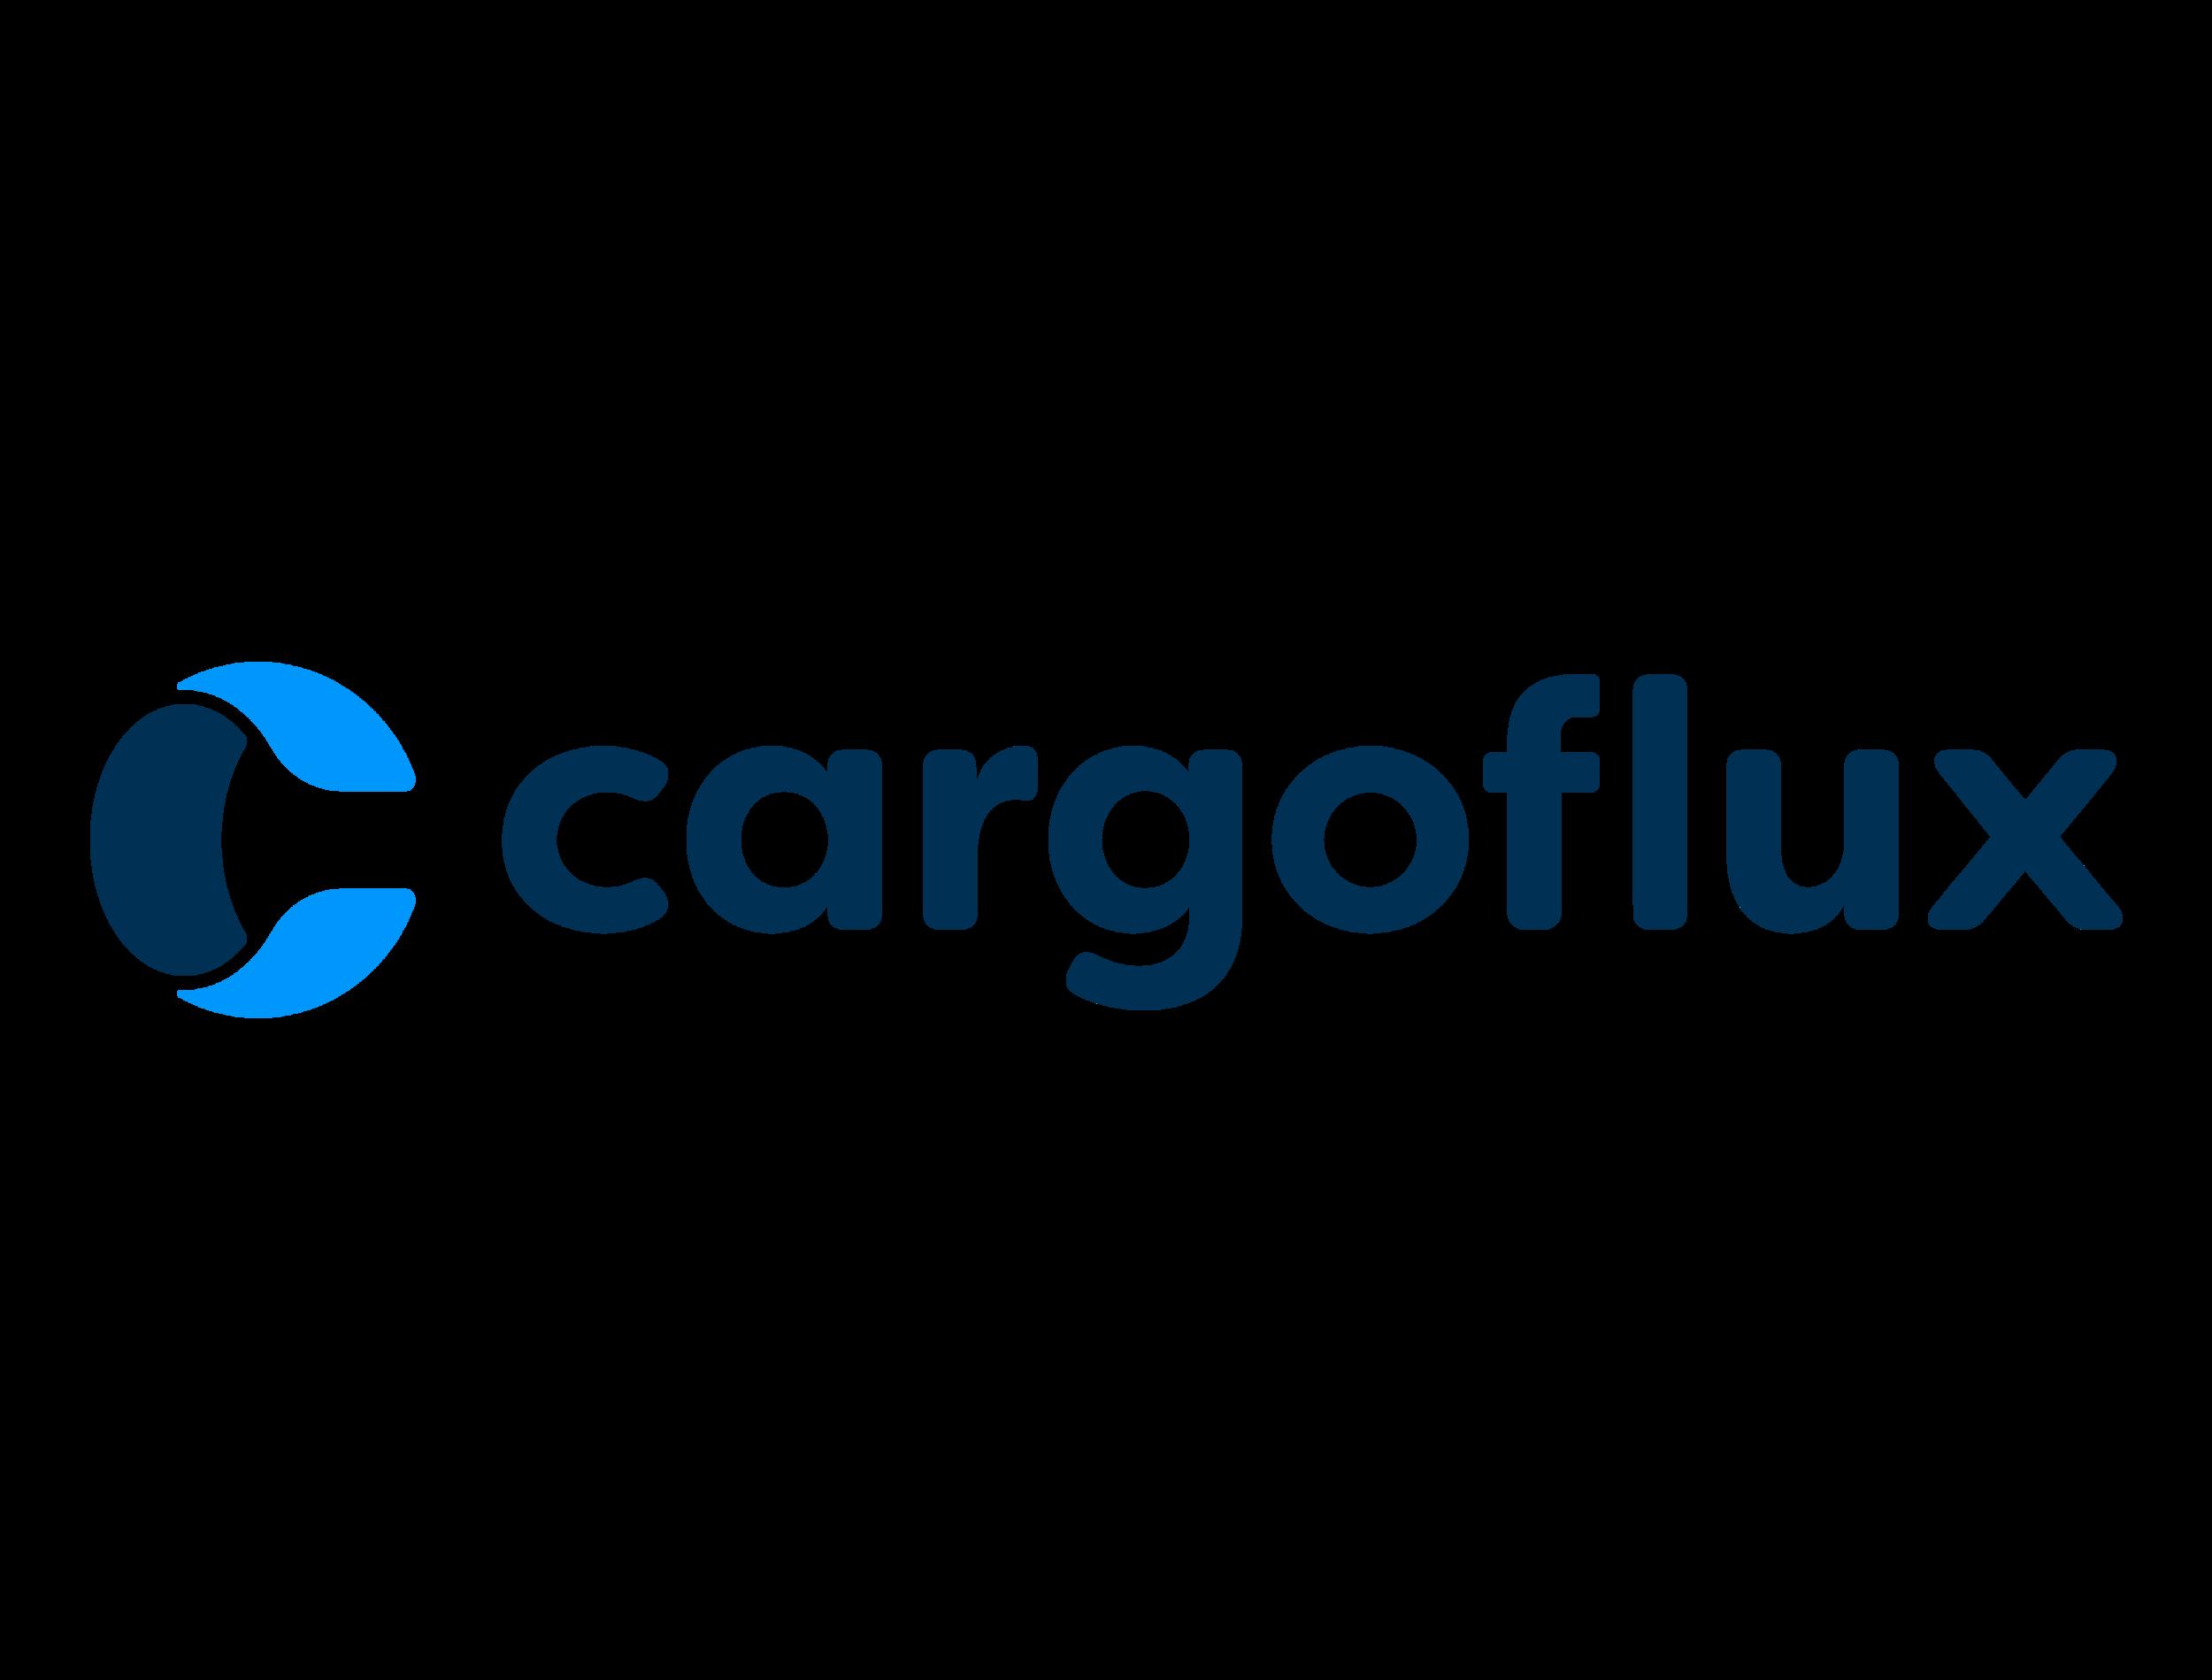 cargoflux_4k_transparent.png